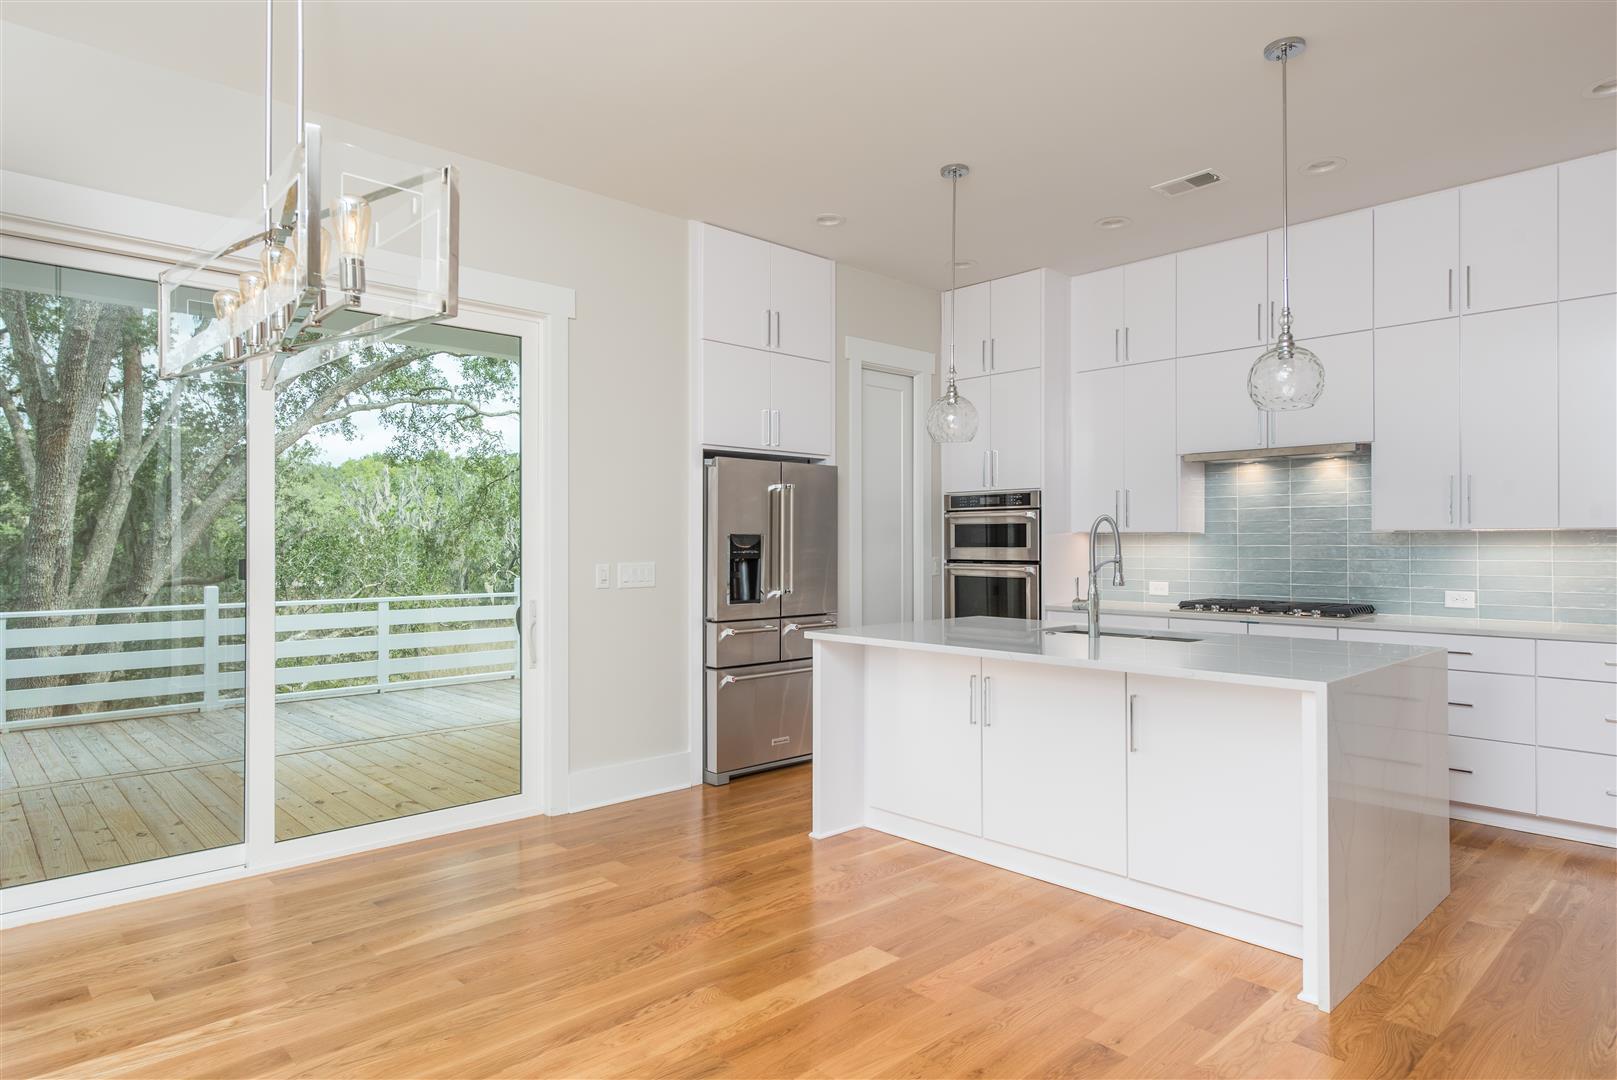 Scanlonville Homes For Sale - 160 5th, Mount Pleasant, SC - 15